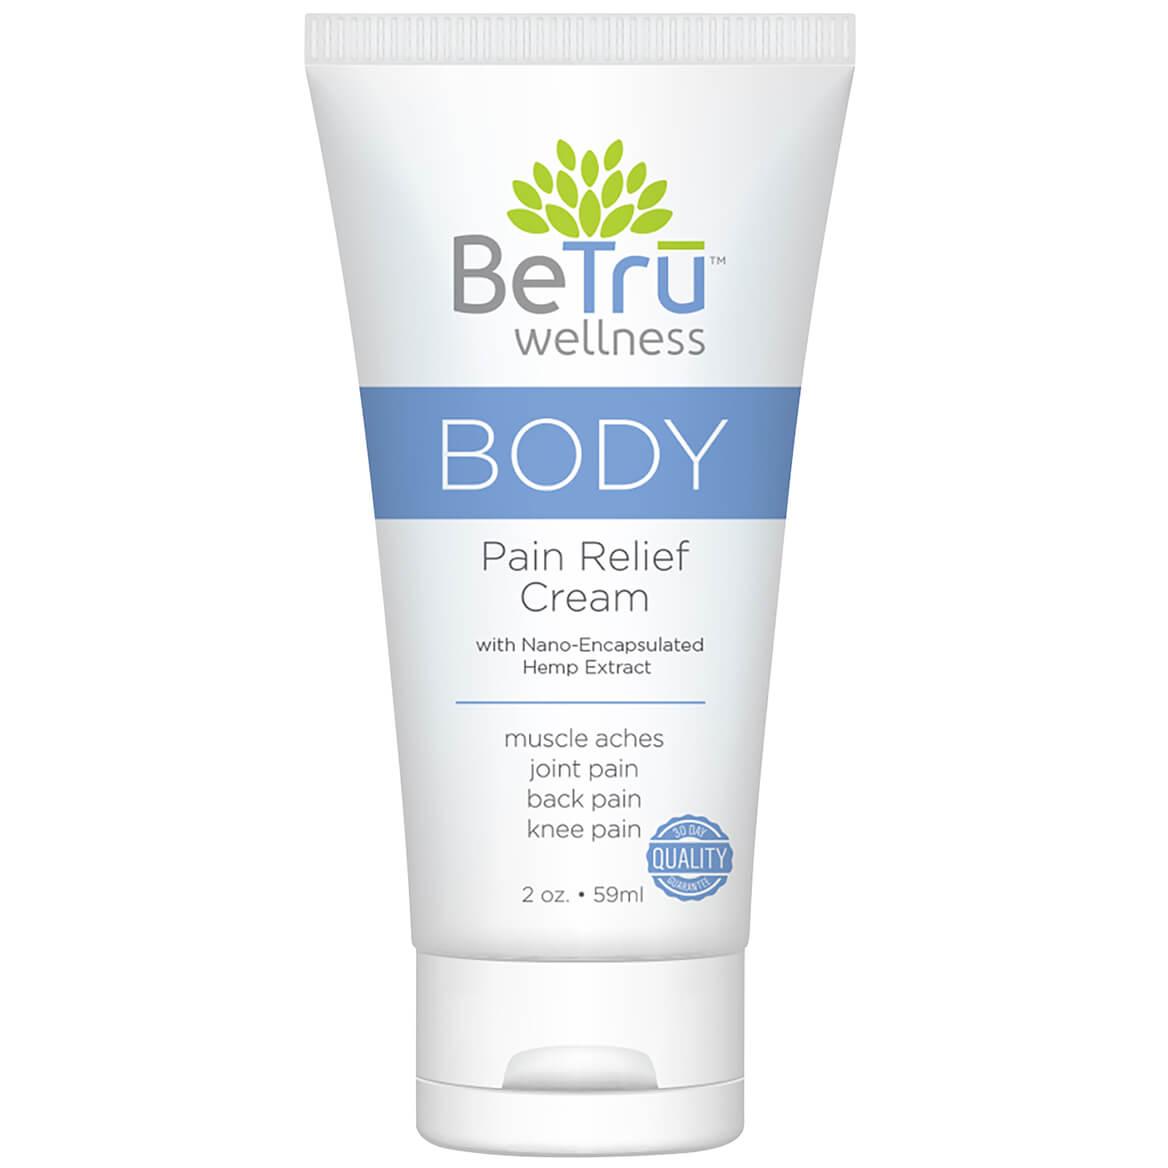 Be Trū™ BODY Pain Relief Cream with Hemp Extract-369208